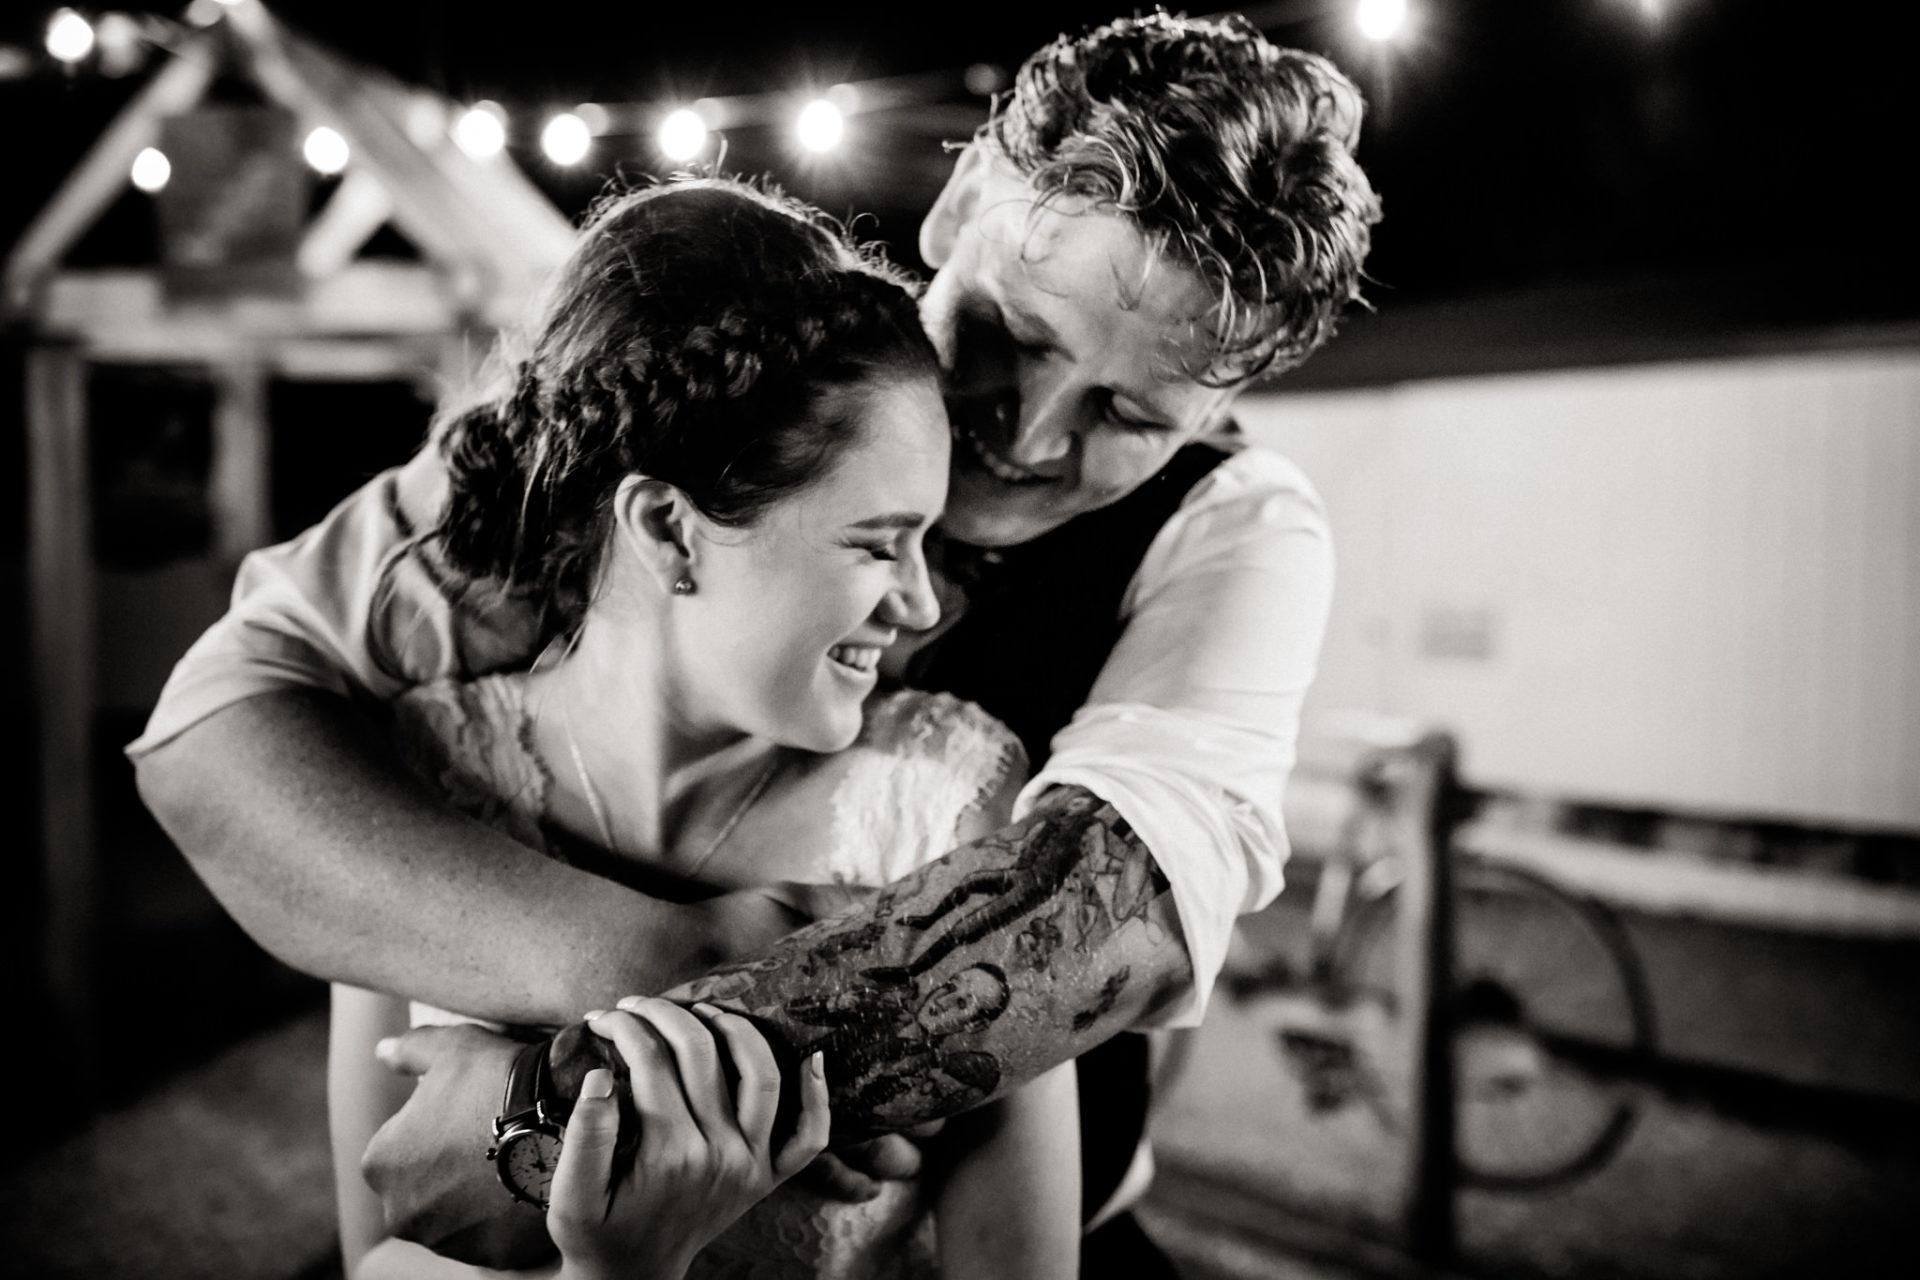 backyard wedding melbourne-trend 2019-garden wedding at home-fairy lights-bride groom portrait-night time-